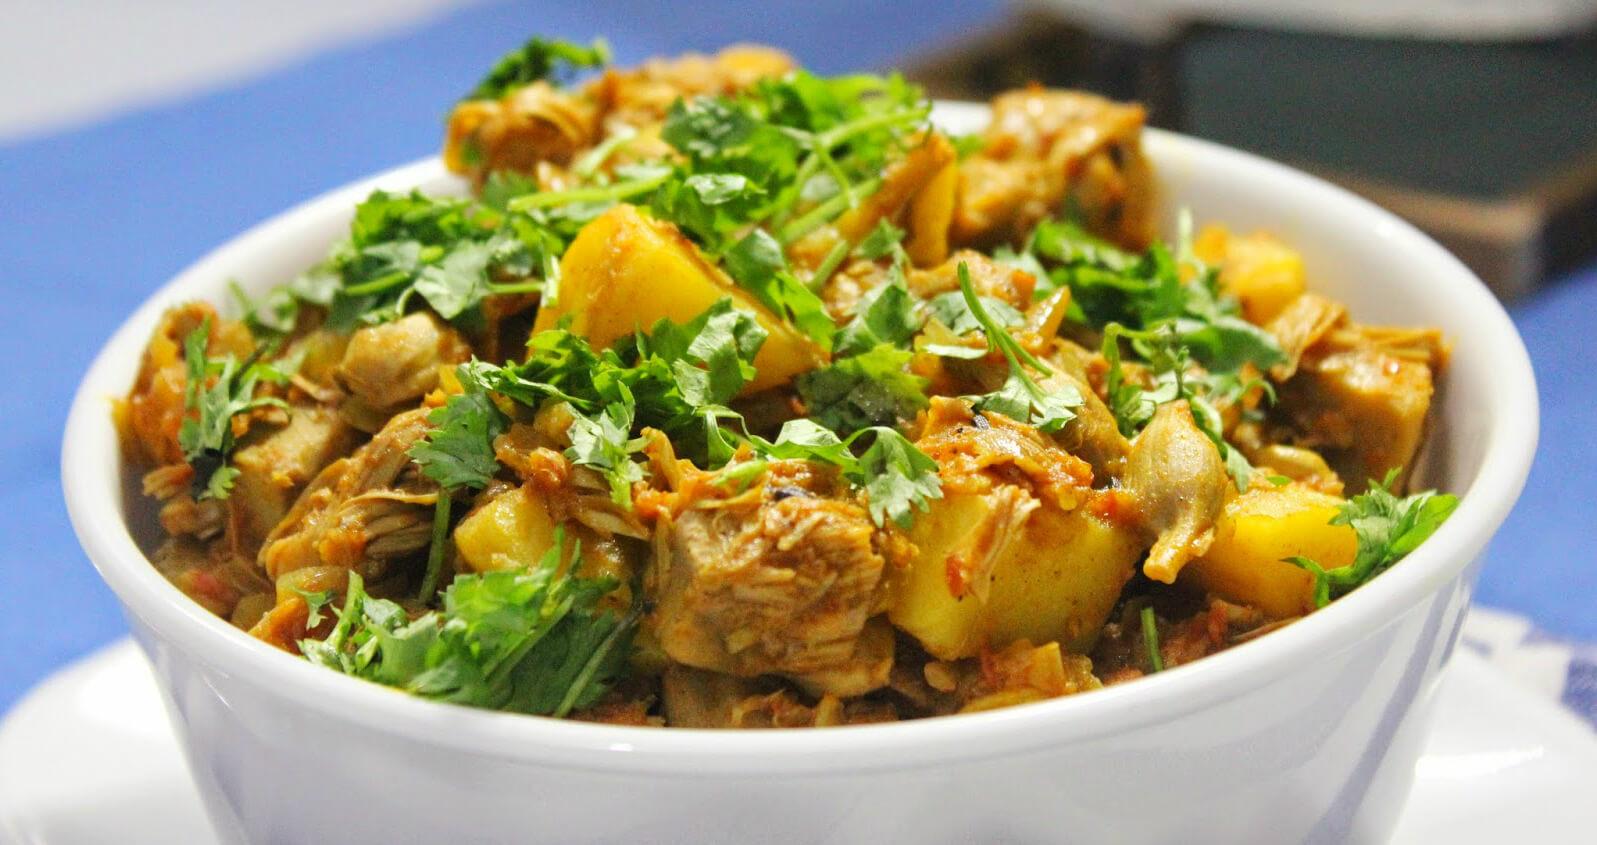 trader joe's launches vegan yellow jackfruit curry ready meal